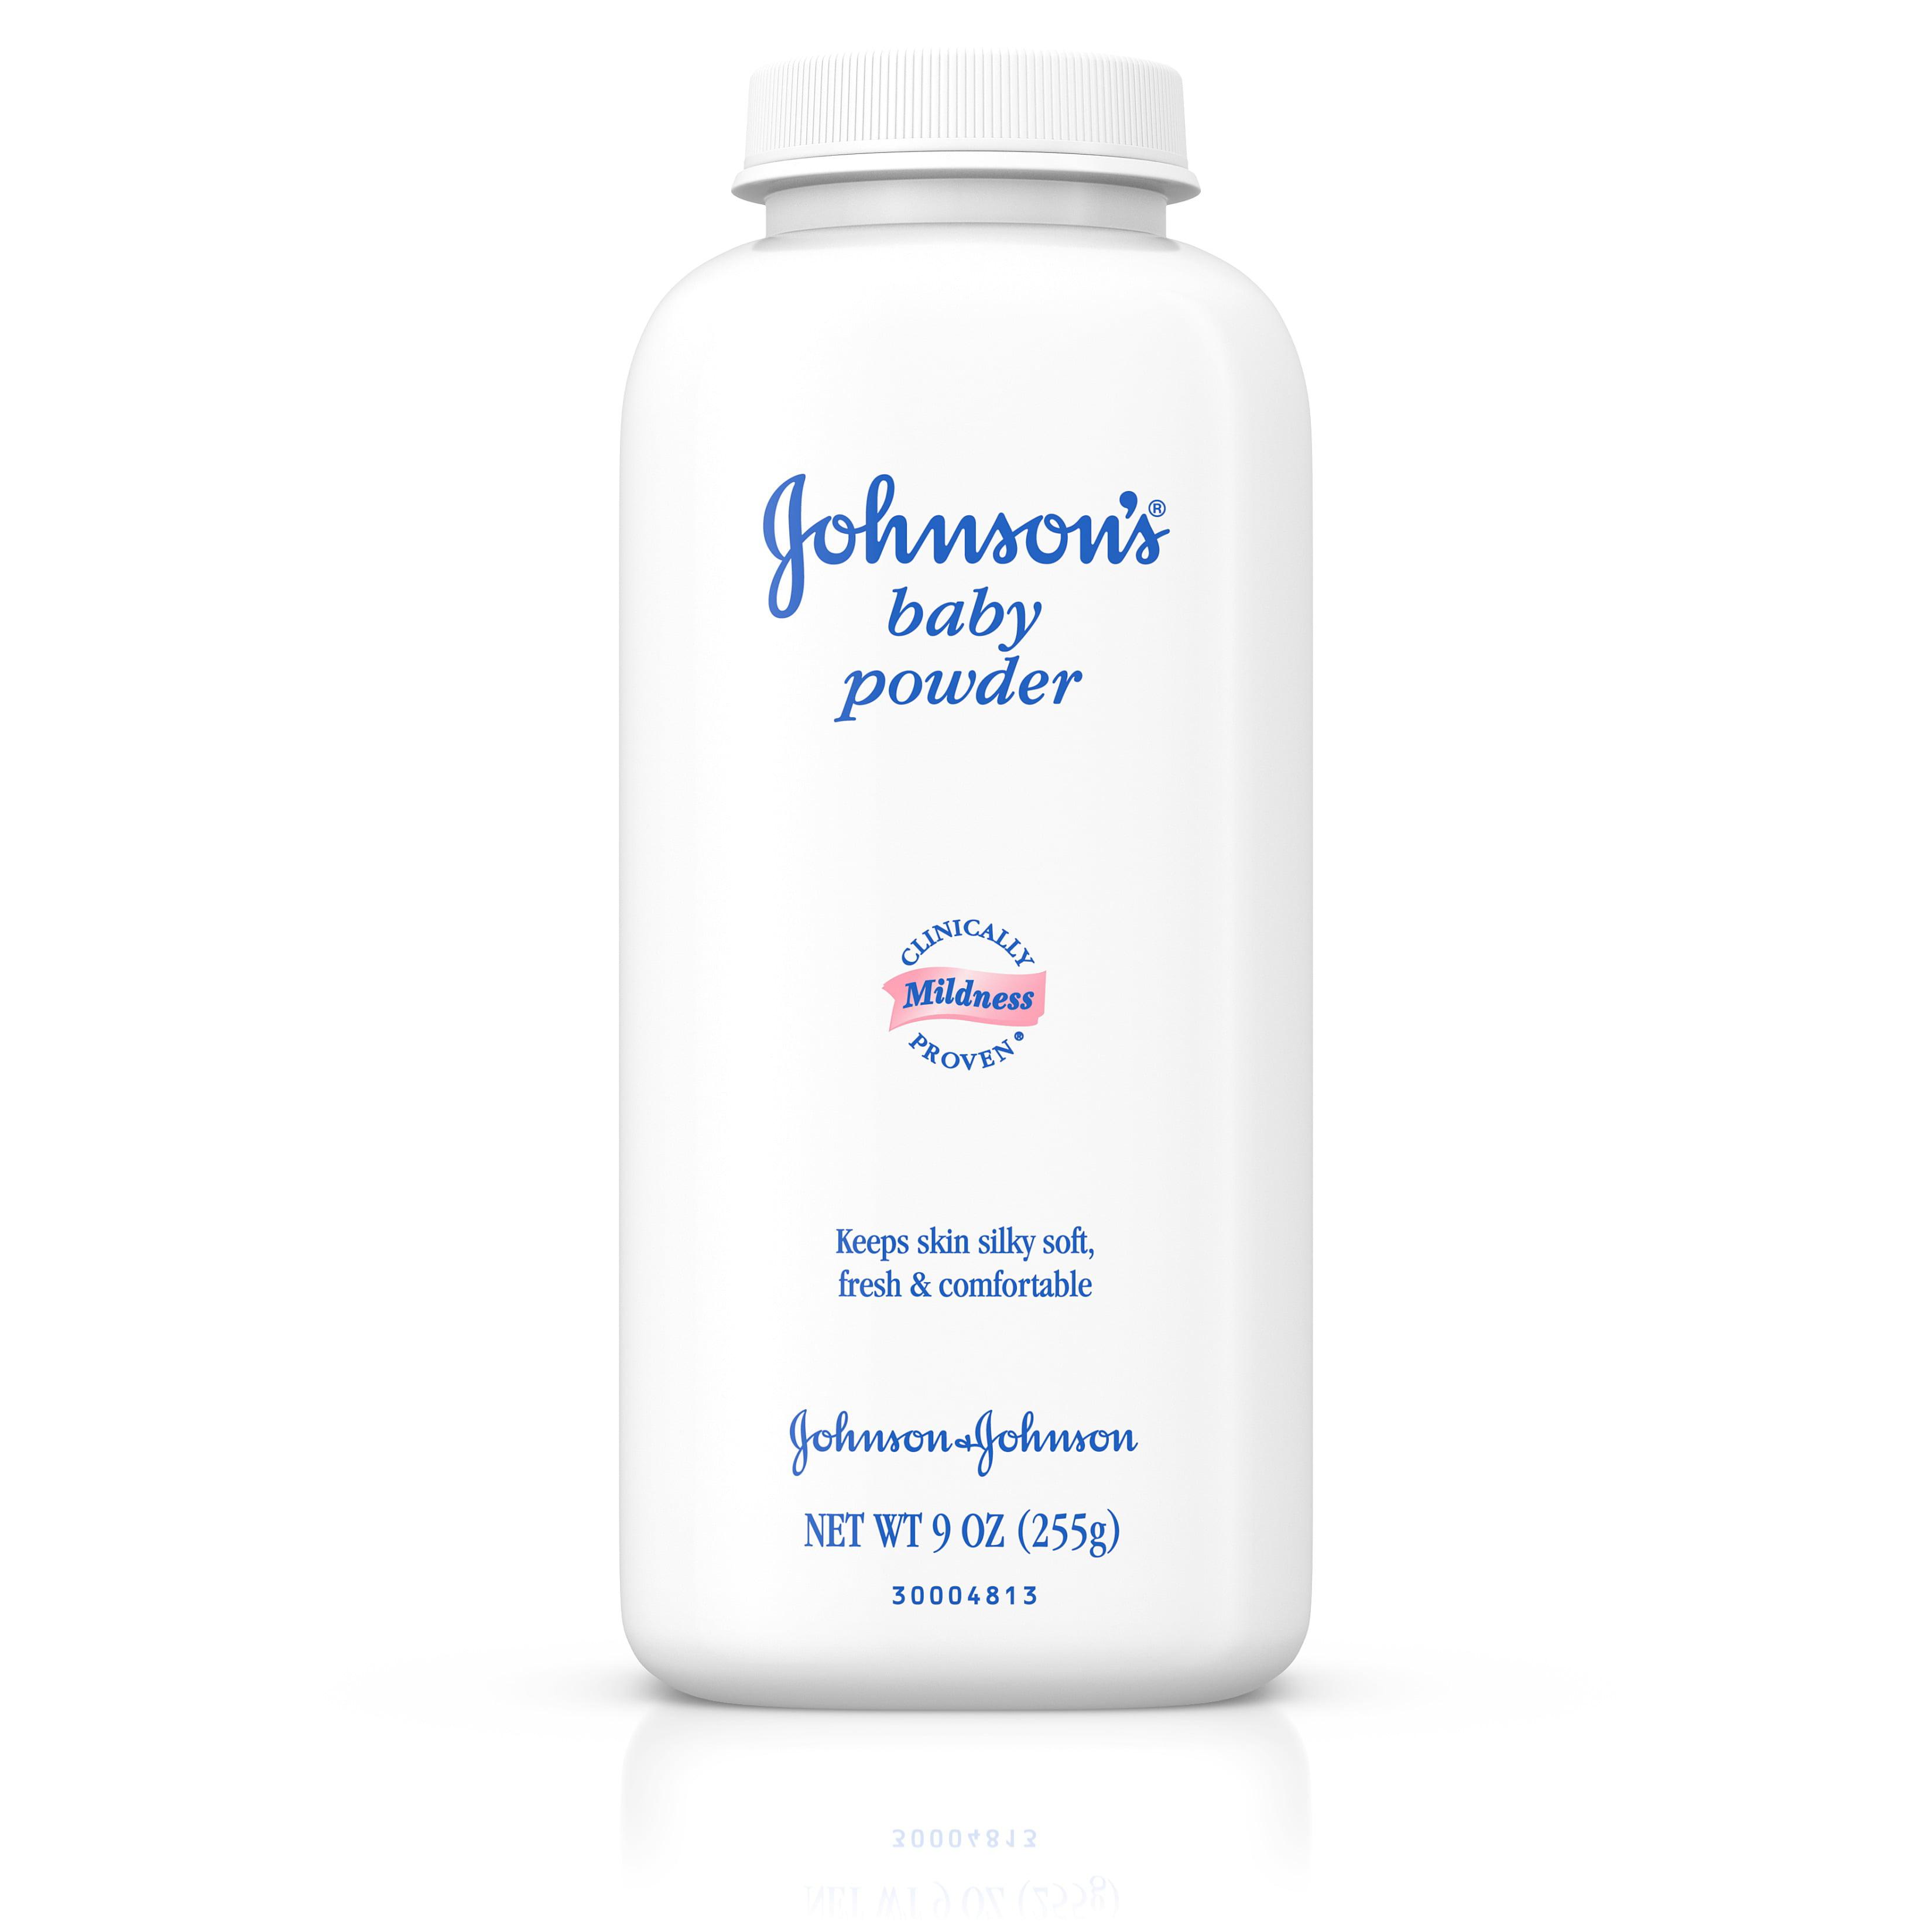 Johnson's Baby Powder To Help Prevent Diaper Rash, 9 Oz.